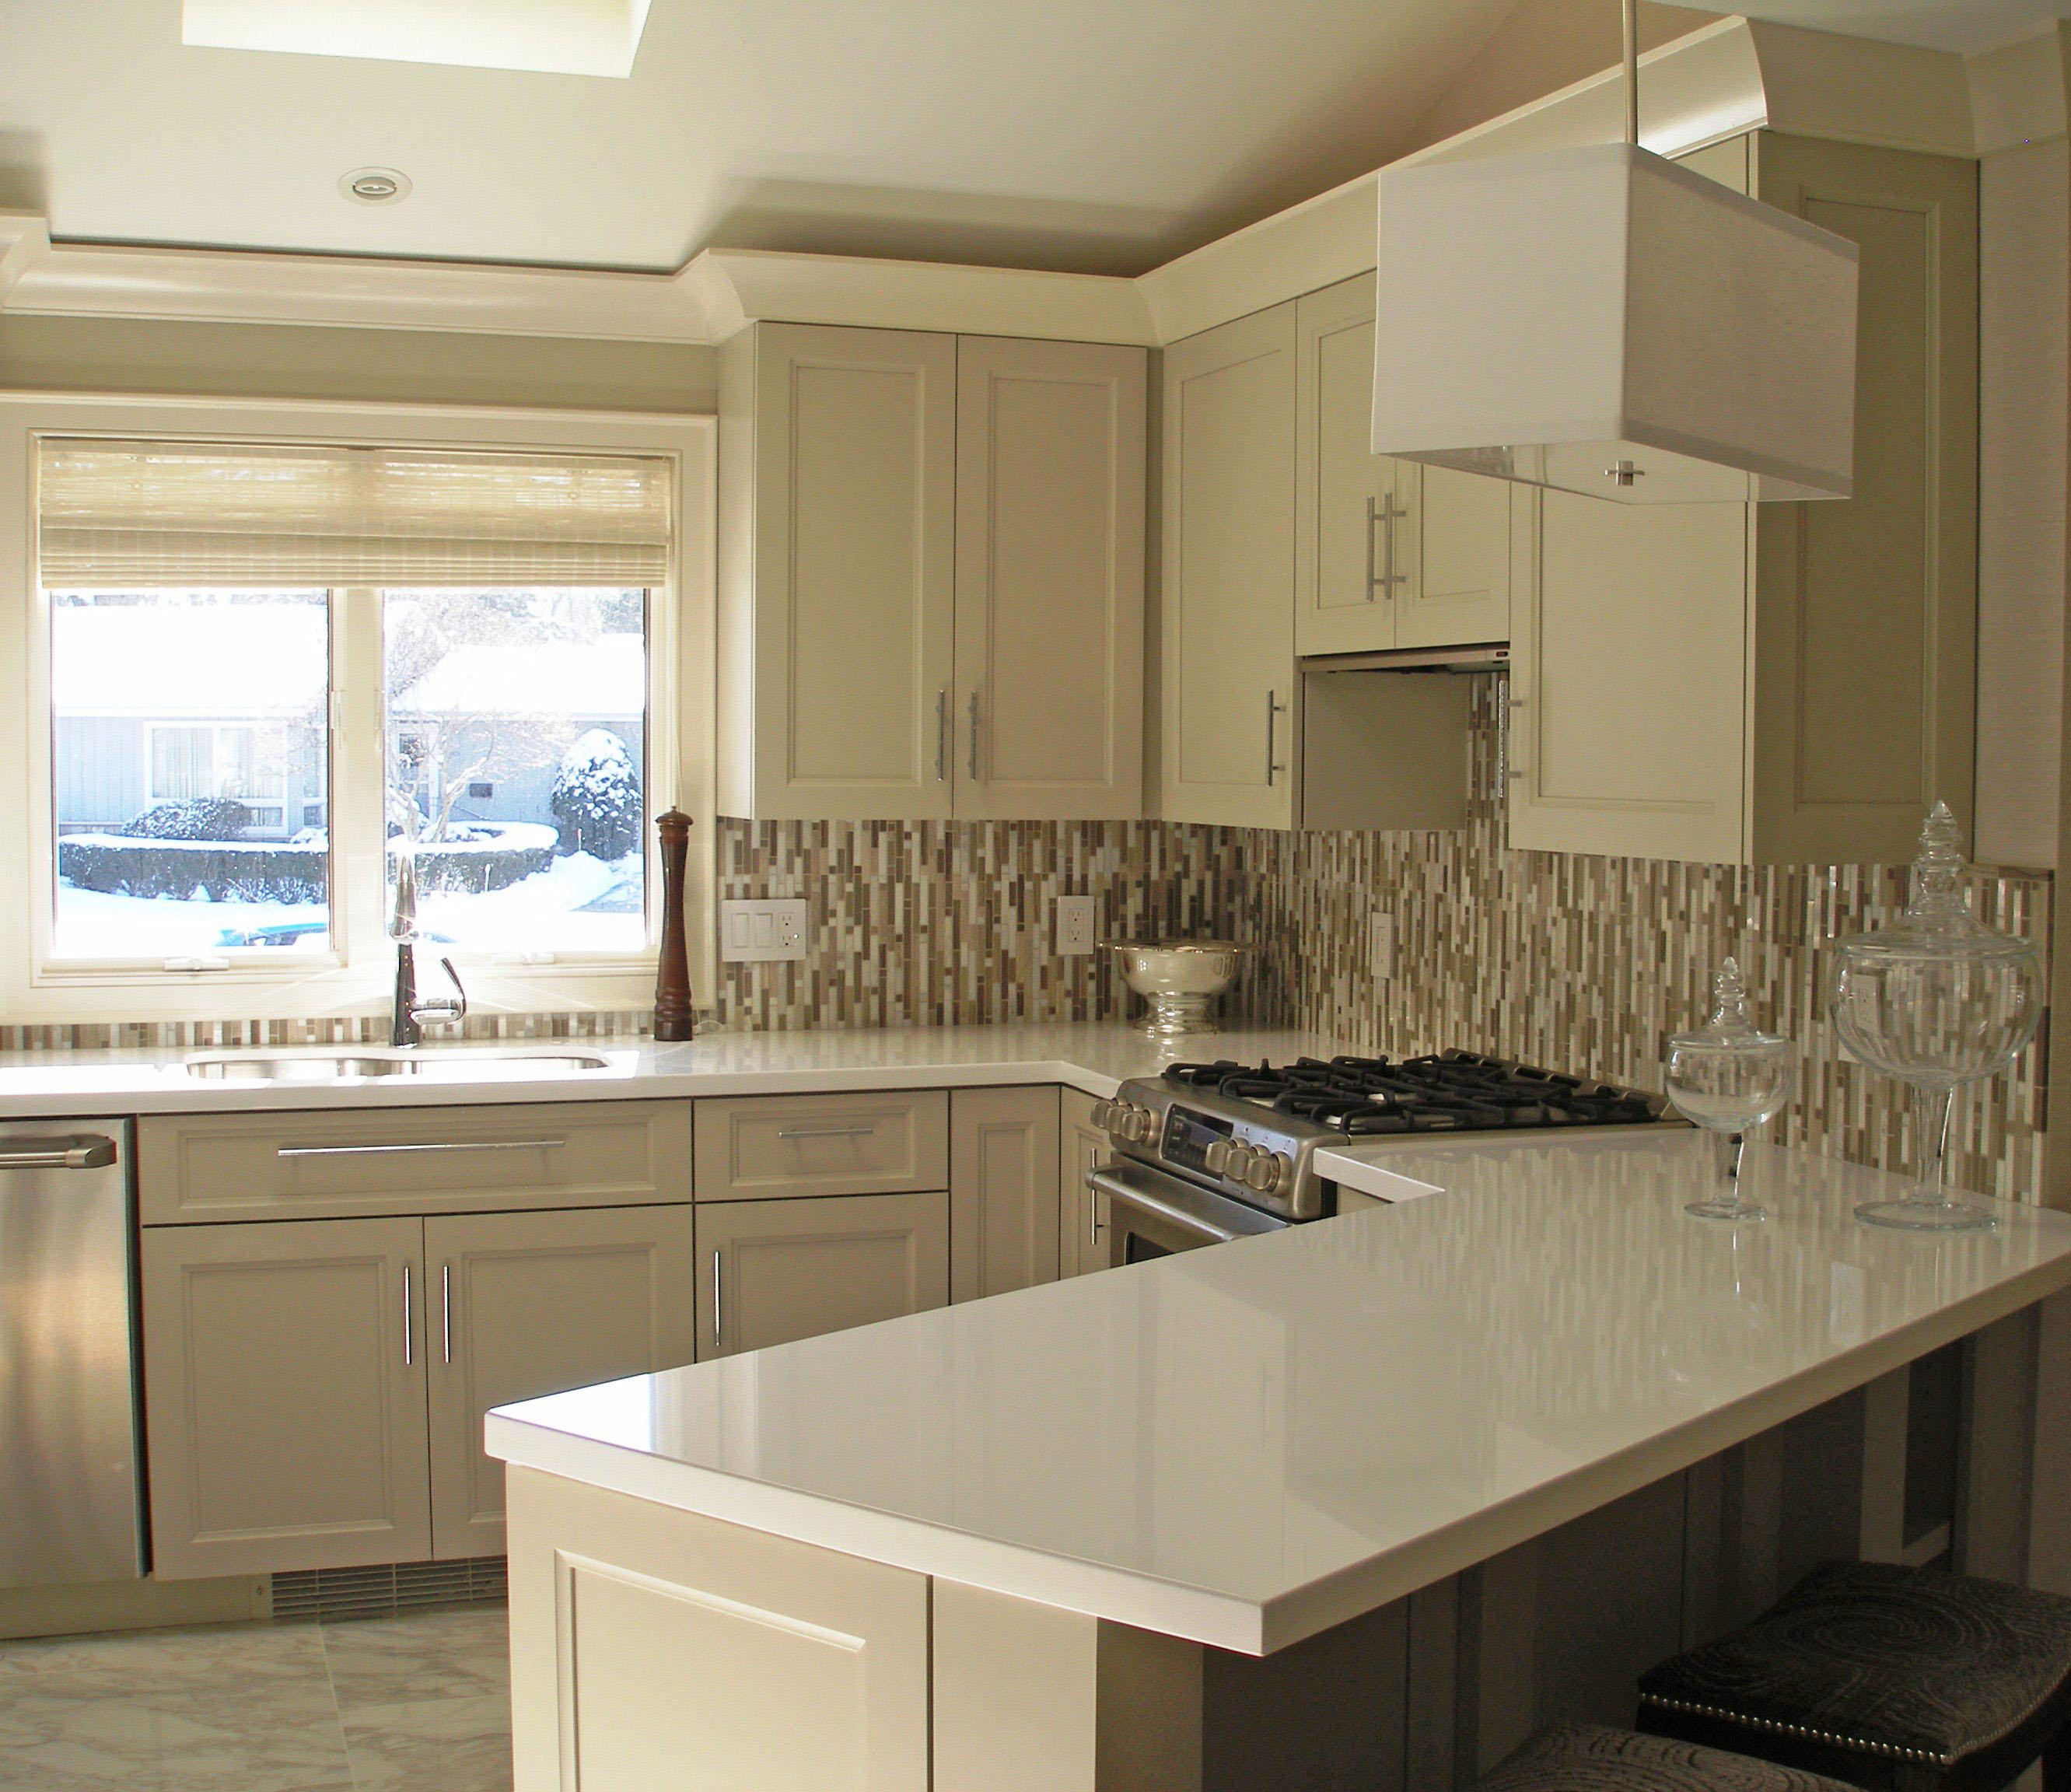 Crisp clean European full overlay cabinets